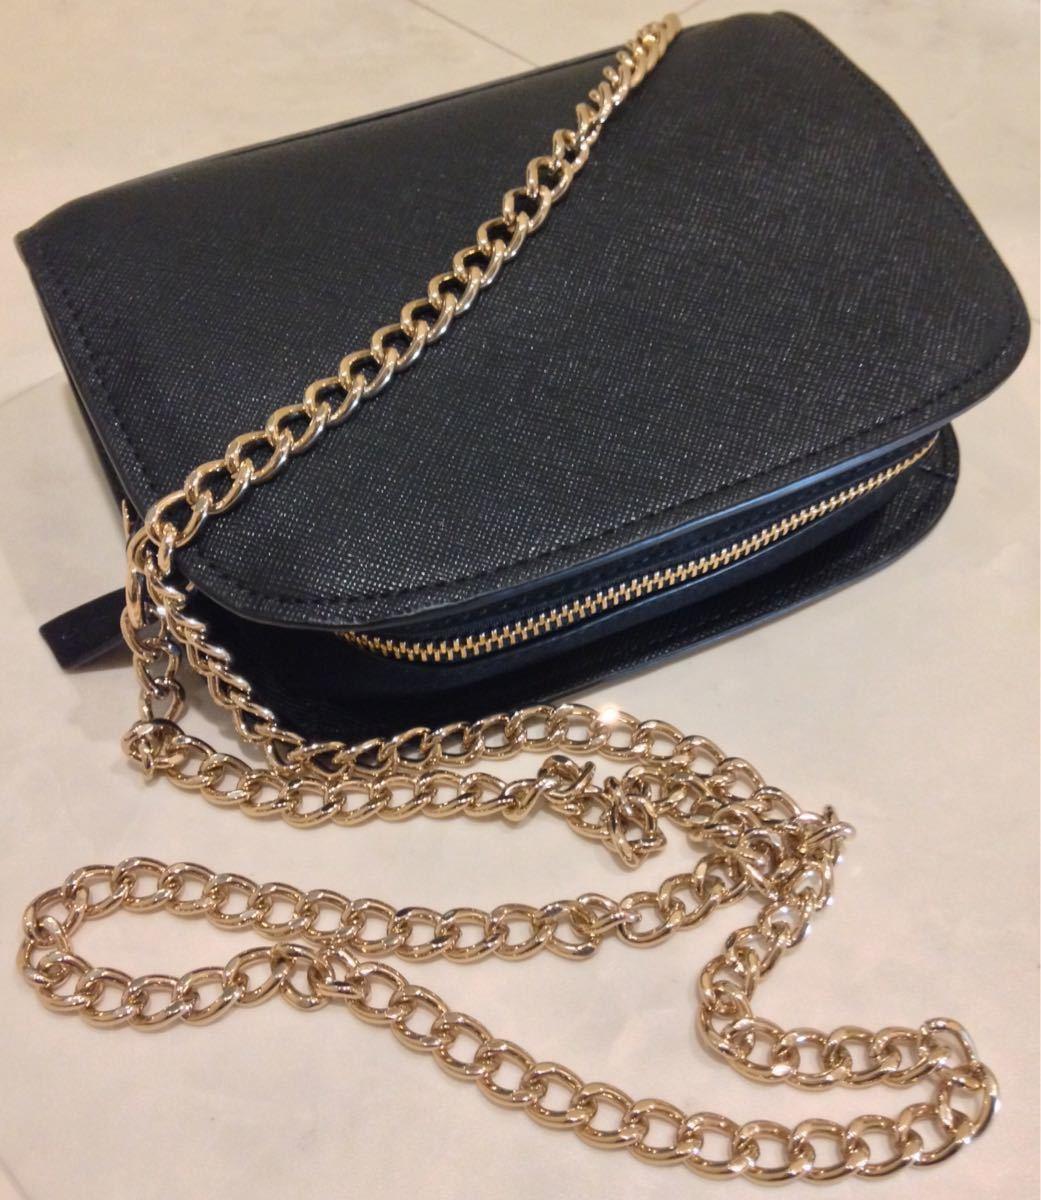 1ff6843b3ac6 ... レザー革調チェーンショルダー兼ハンドバッグ/ブラック×ゴールド黒×金/女性レディースブランド鞄. 商品數量: :1